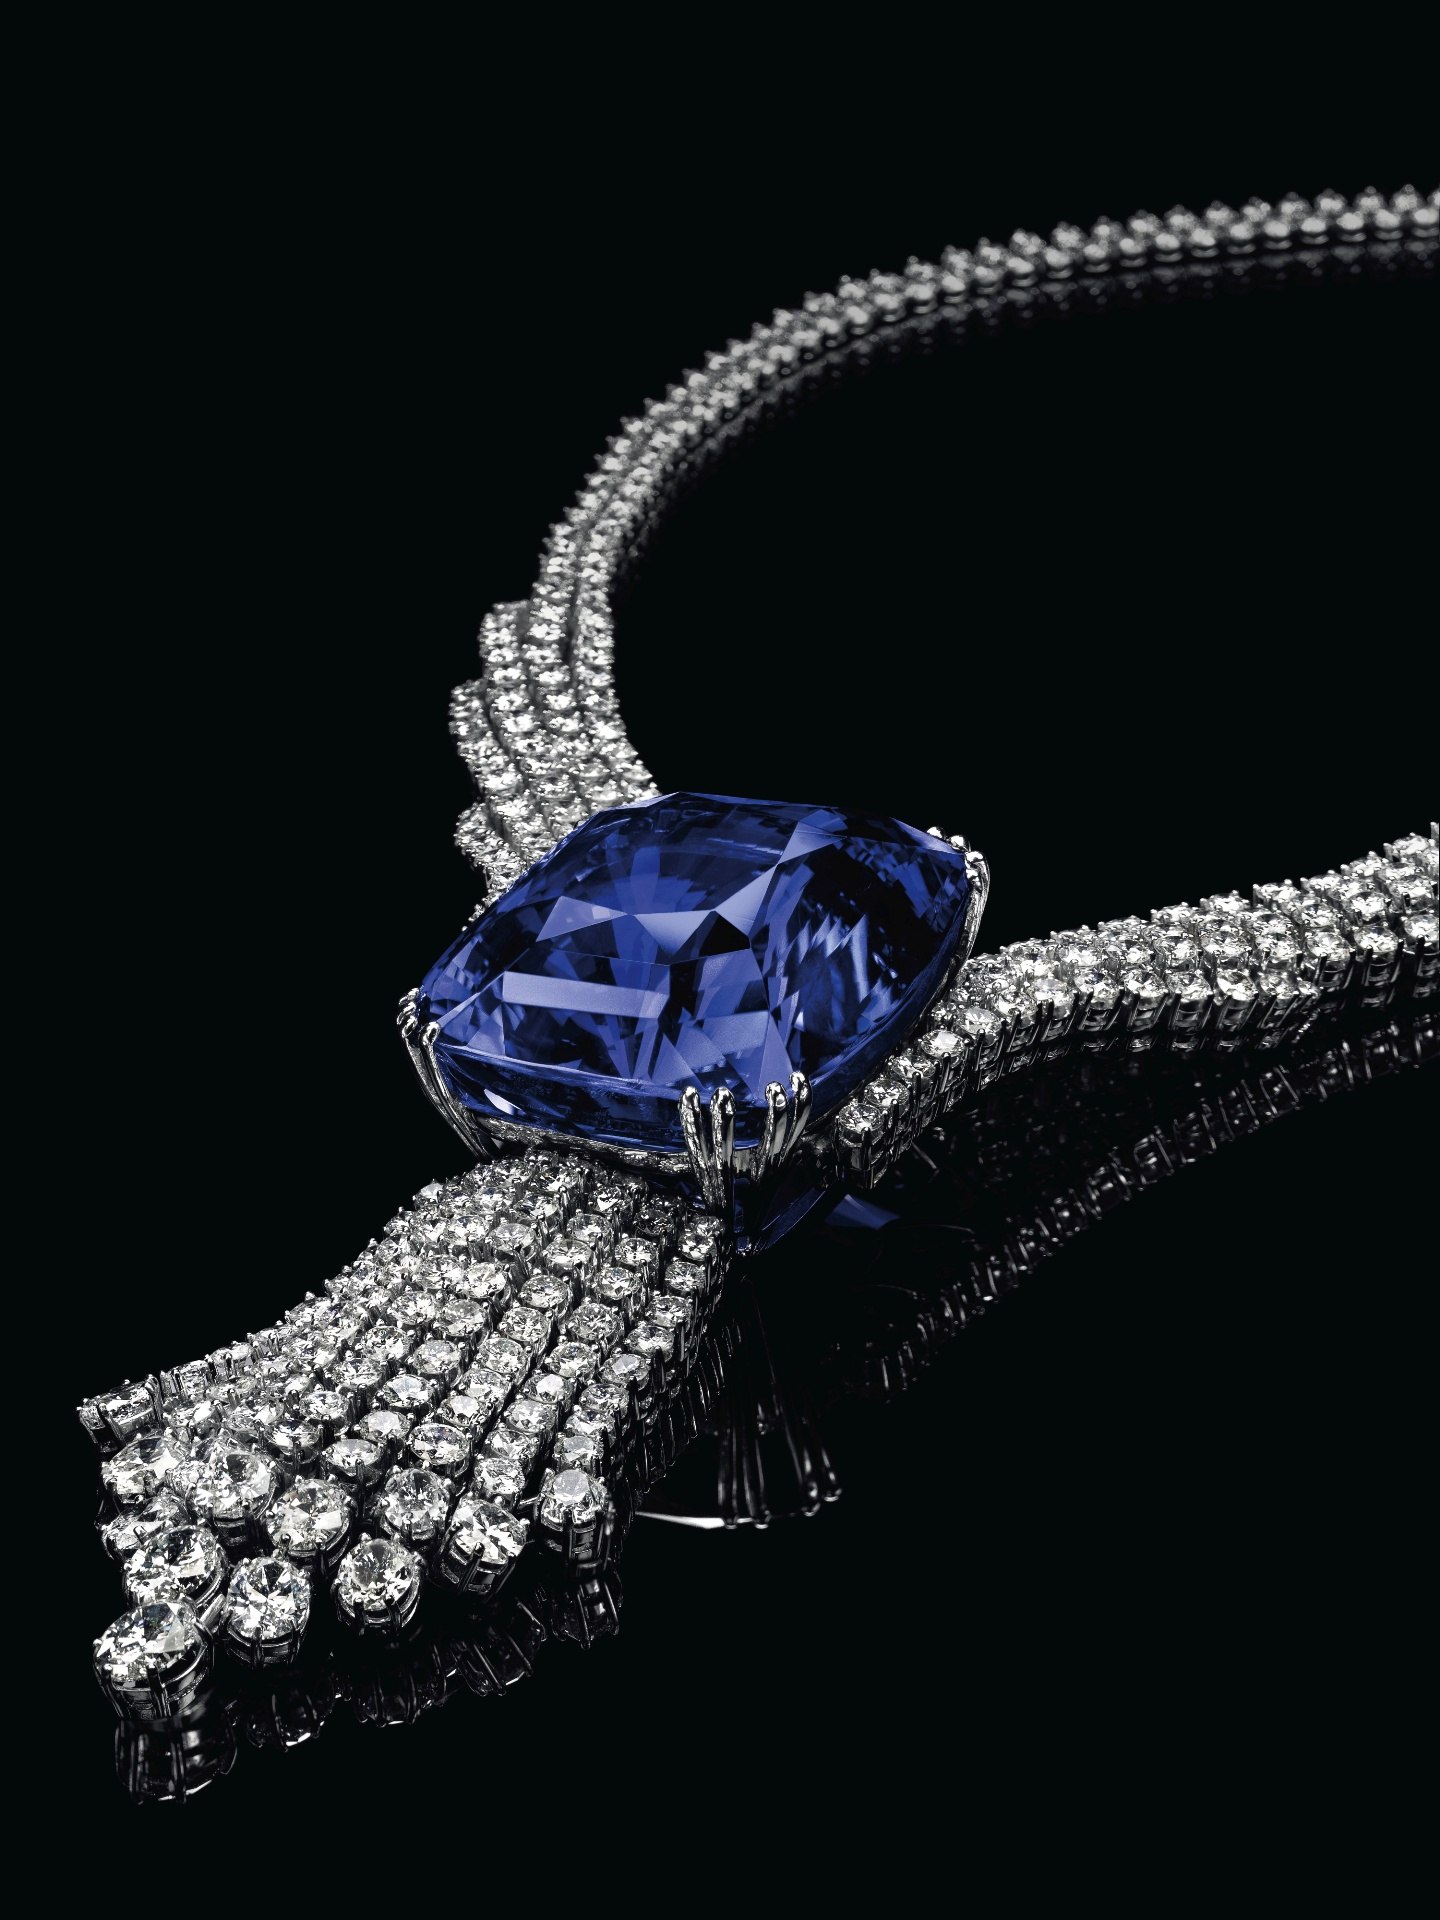 Blue Belle of Asia: Краса Азии